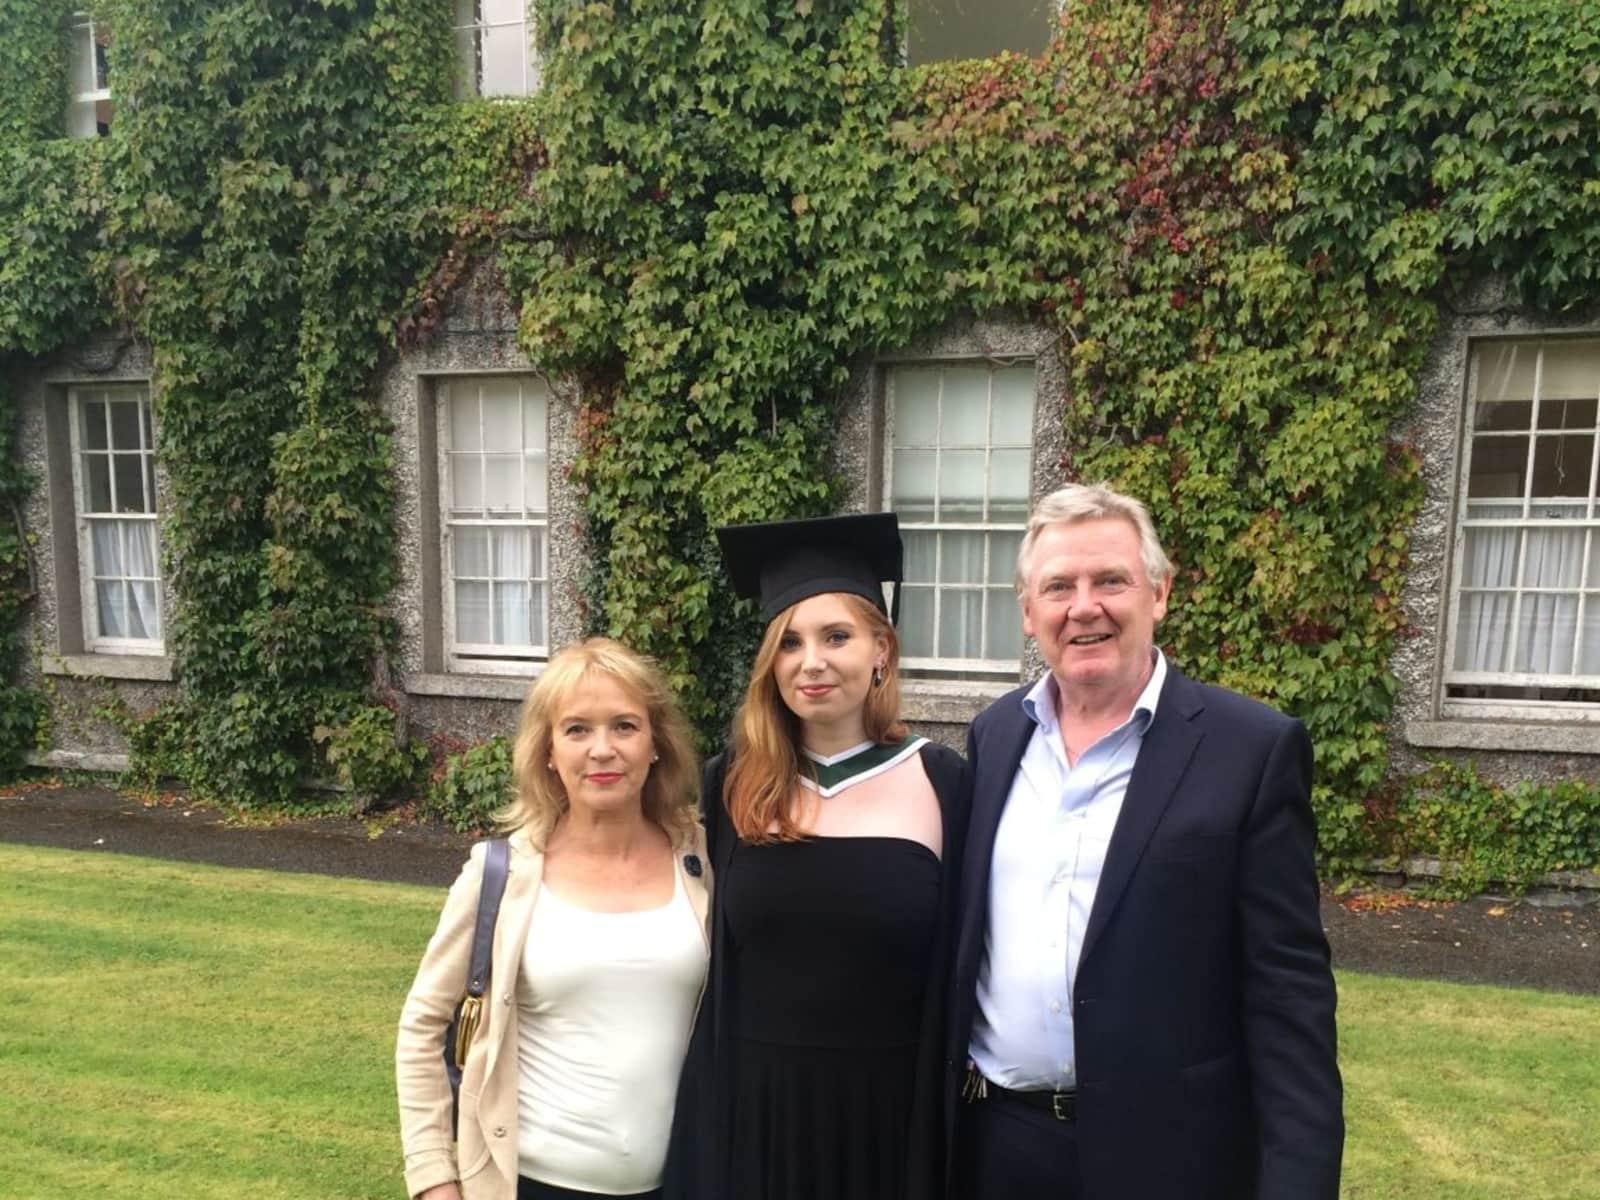 Peter & Kay from Dublin, Ireland